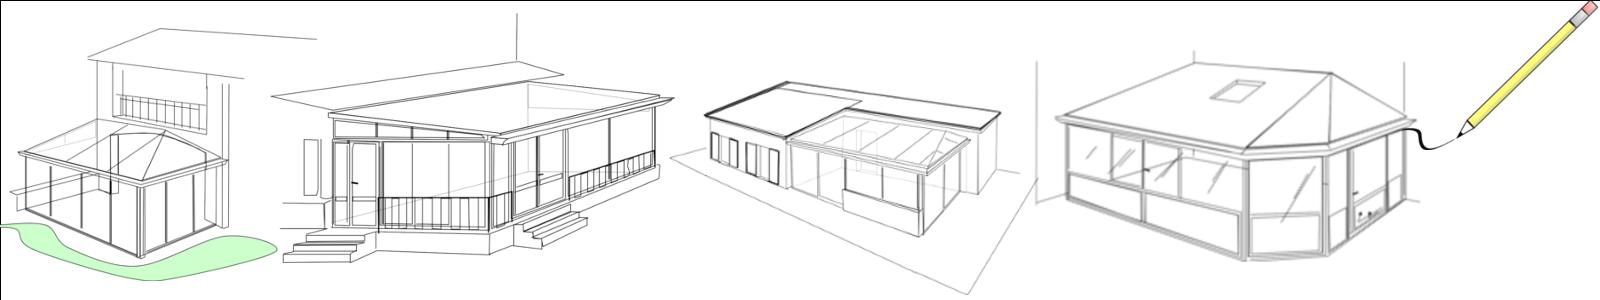 fabricant de v randas r alisation d 39 extensions bois alu. Black Bedroom Furniture Sets. Home Design Ideas